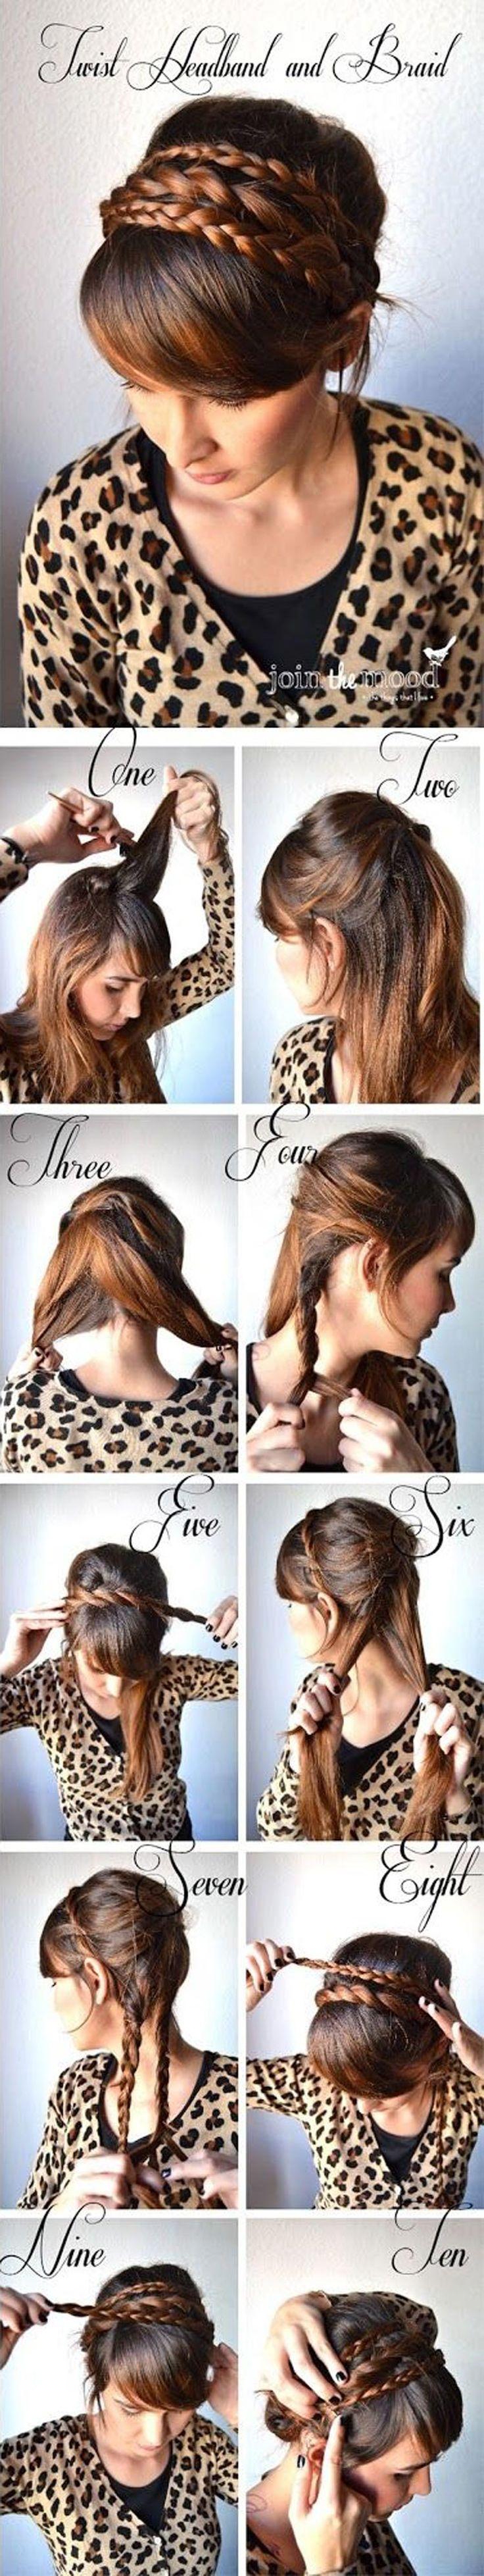 Upleťte si do vlasů čelenku z vlastních pramenů vlasů. U výčesu tak opticky vytvoříte nádherný falešný drdol.